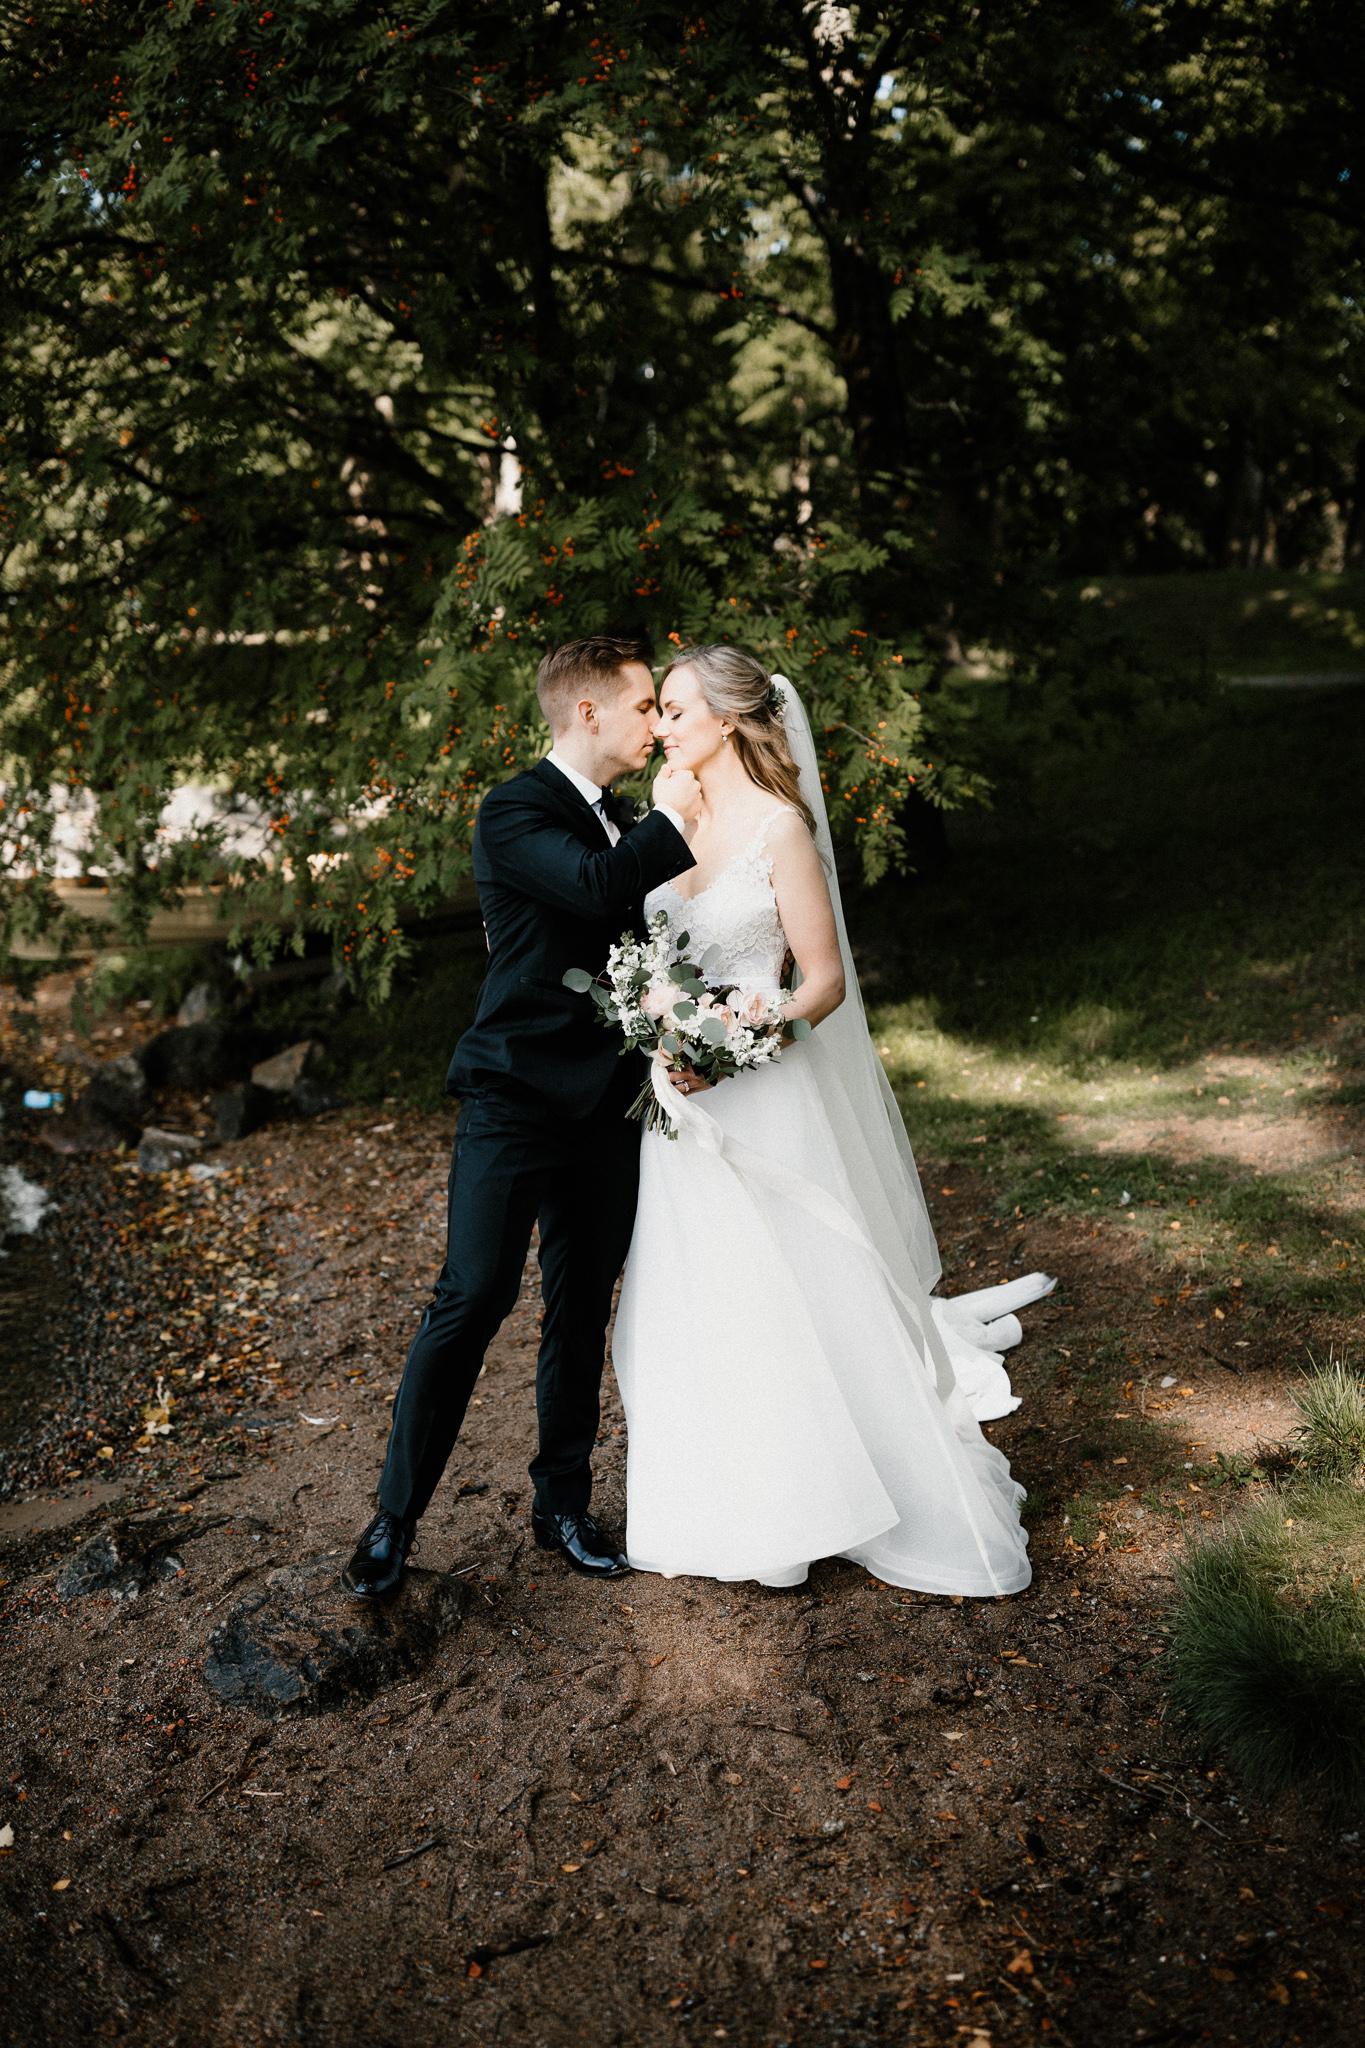 Johanna + Mikko - Tampere - Photo by Patrick Karkkolainen Wedding Photographer-36.jpg